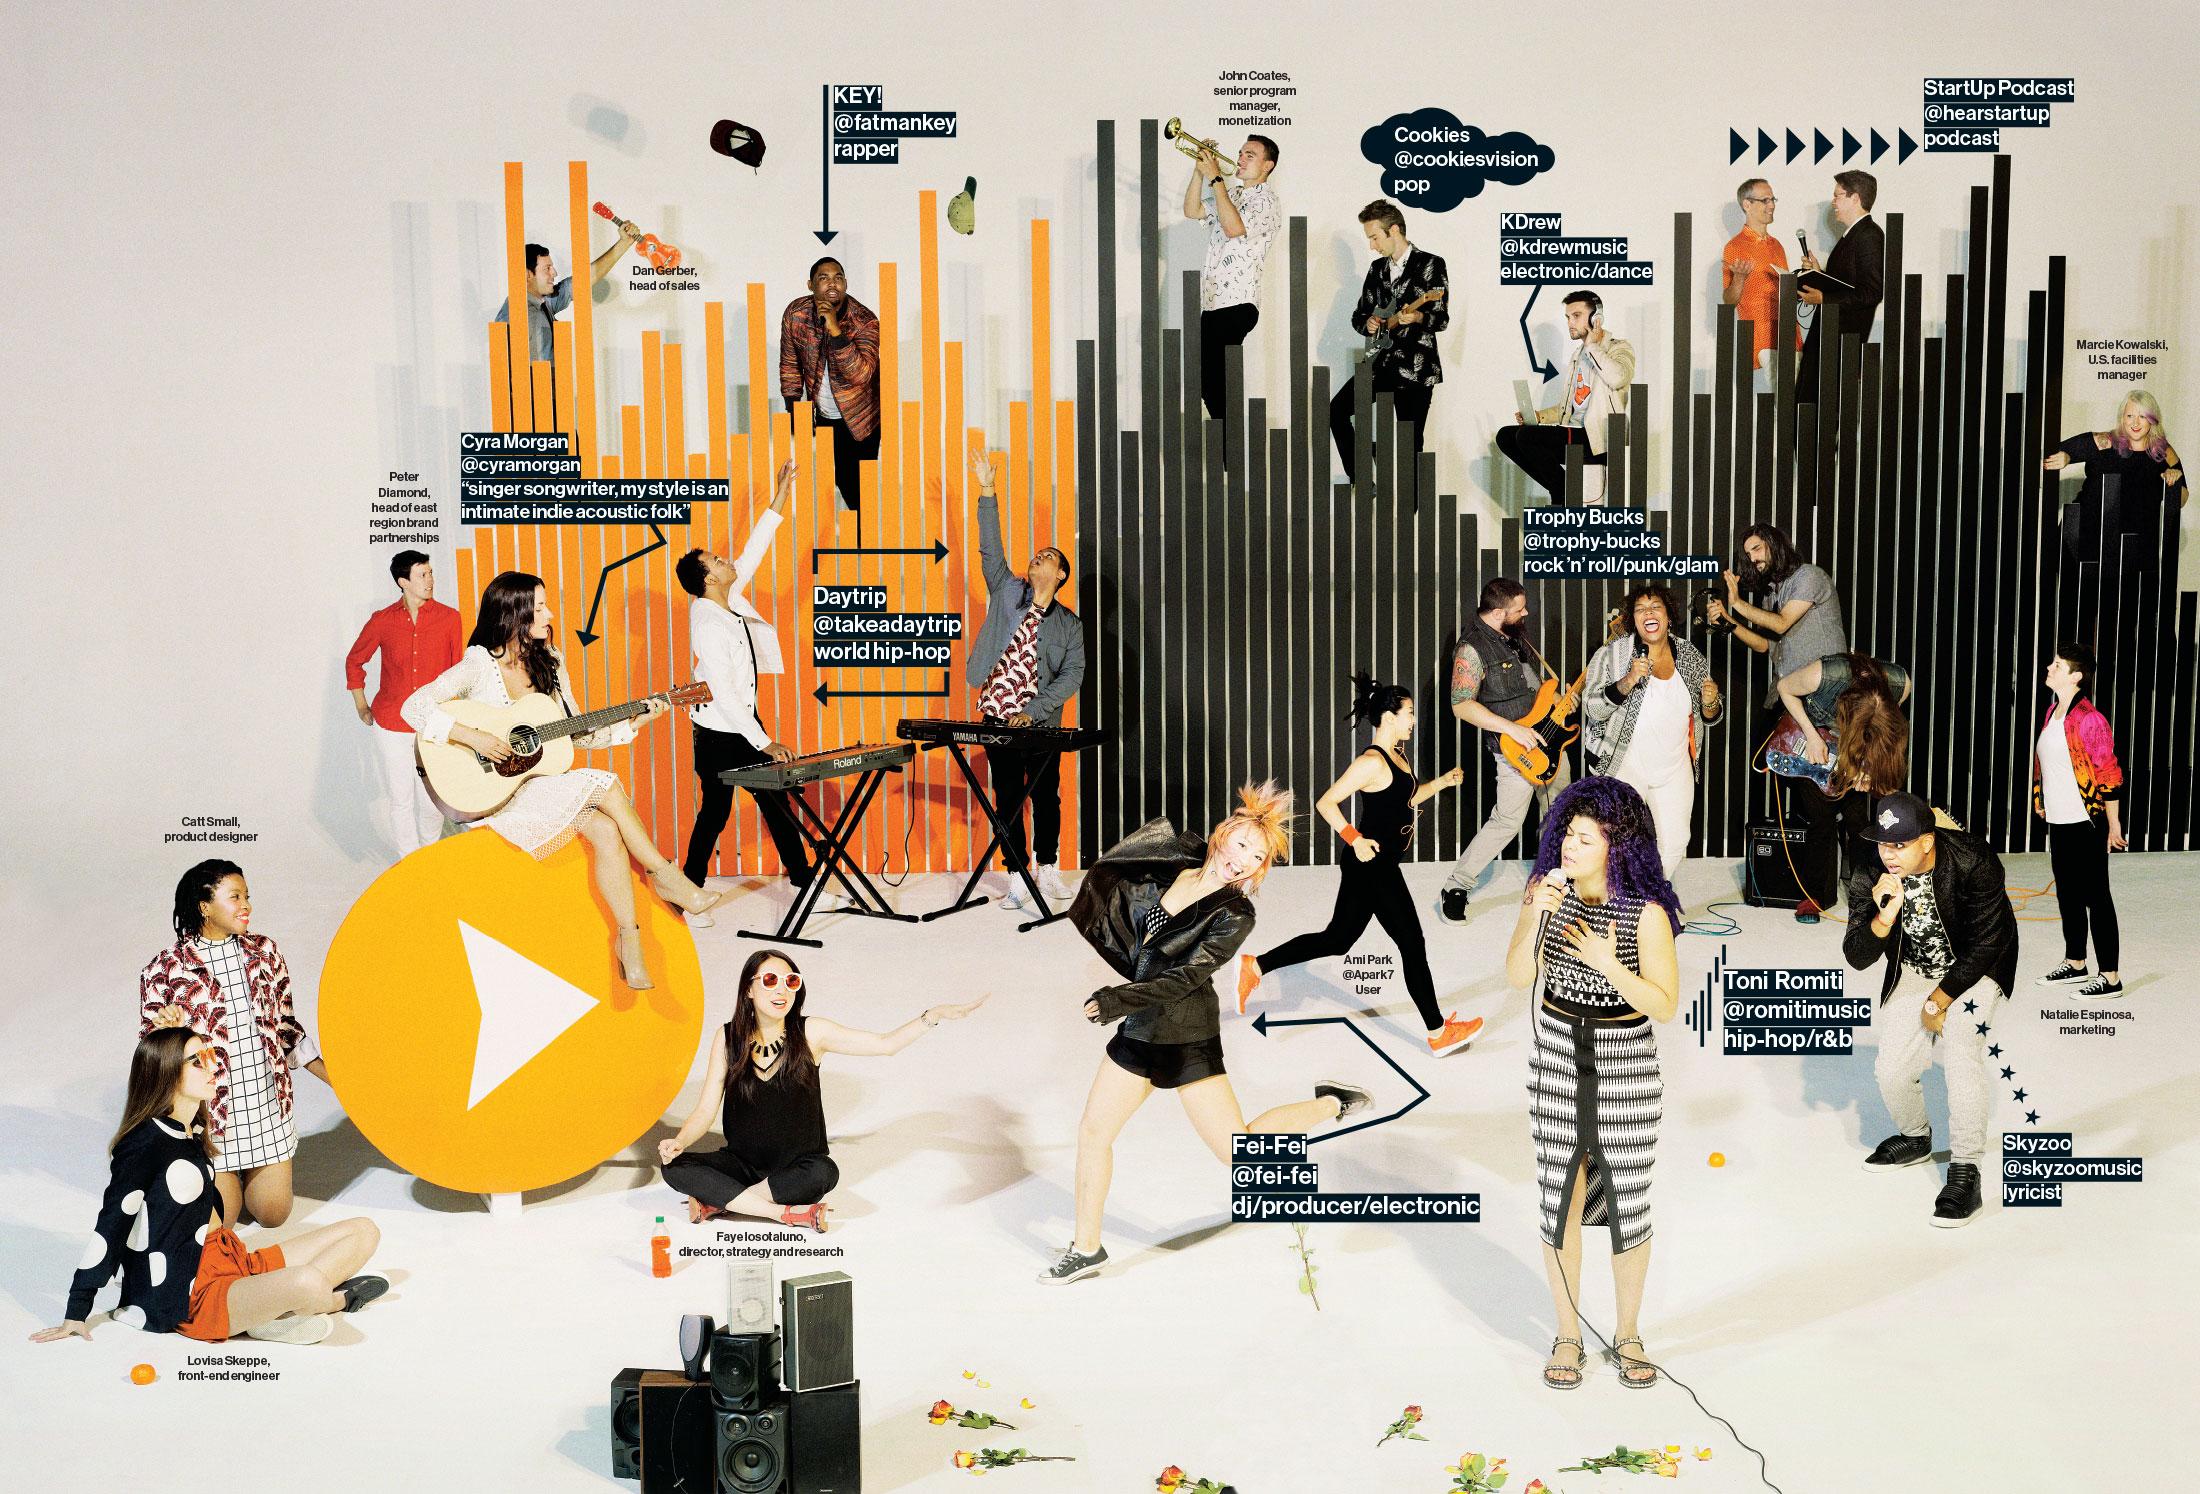 From Left: Skeppe: Karen Walker, Ji Oh, Longchamp; Small: Marc Jacobs; Diamond: APC, The Generic Man; Morgan: Zimmerman, A+; Isostaluno; Karen Walker; Daytrip: Vince, Marc Jacobs; Key!: Burton, Oliver Goldsmith; Fei-Fei: Zimmerman, Camilla and Marc, Cushie Et Ochs; Coates: Allsaints; Cookies: Ovadia & Sons; Romiti; Sass & Bide; Trophy Bucks: Alexander McQueen; KDrew: Carven, Kent and Curwen; Skyzoo: Theroy; Espinosa: Fifteen & Half